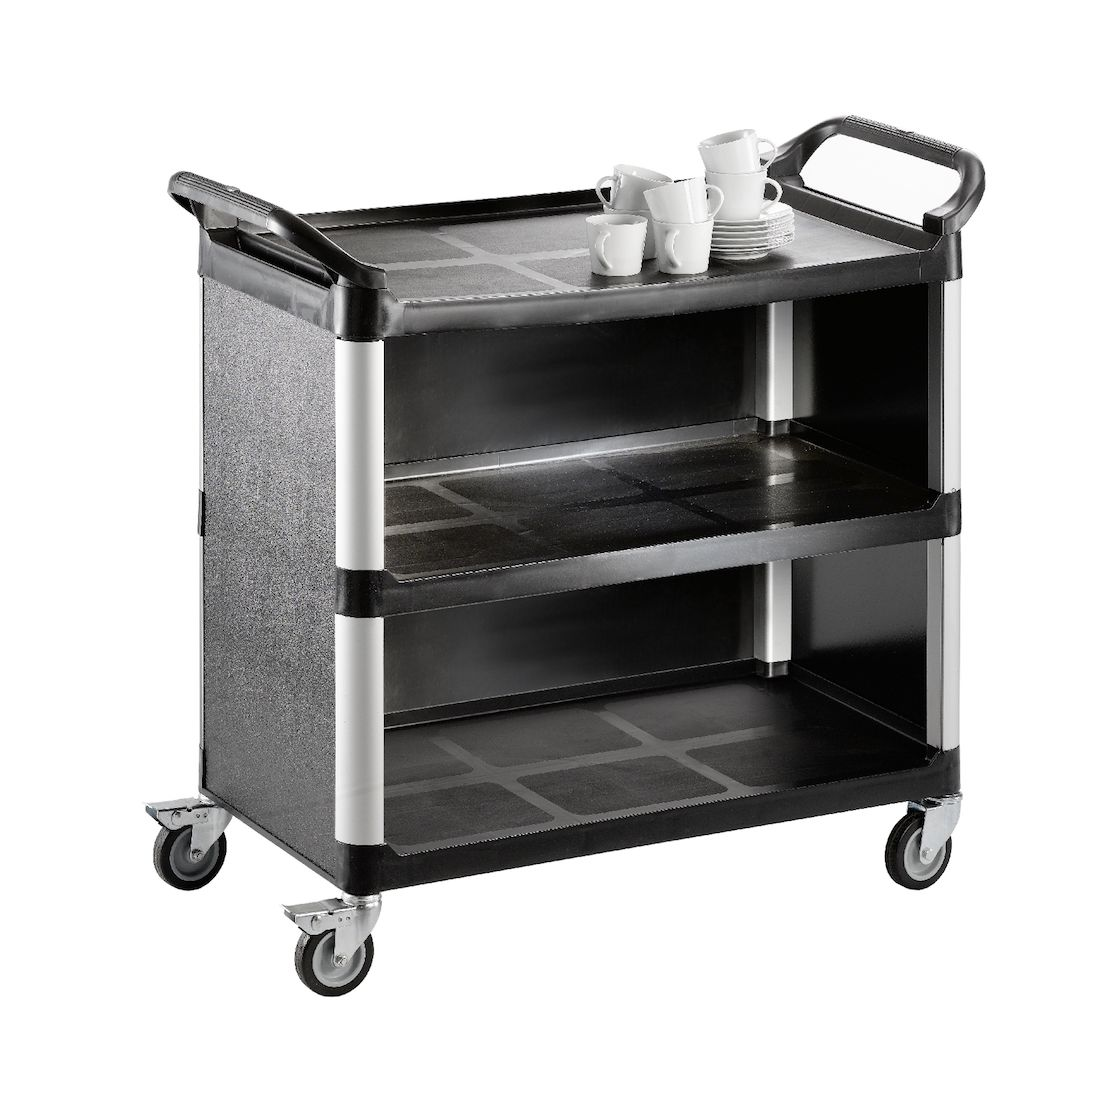 chariot de service ferme 3 tablettes xl saro. Black Bedroom Furniture Sets. Home Design Ideas